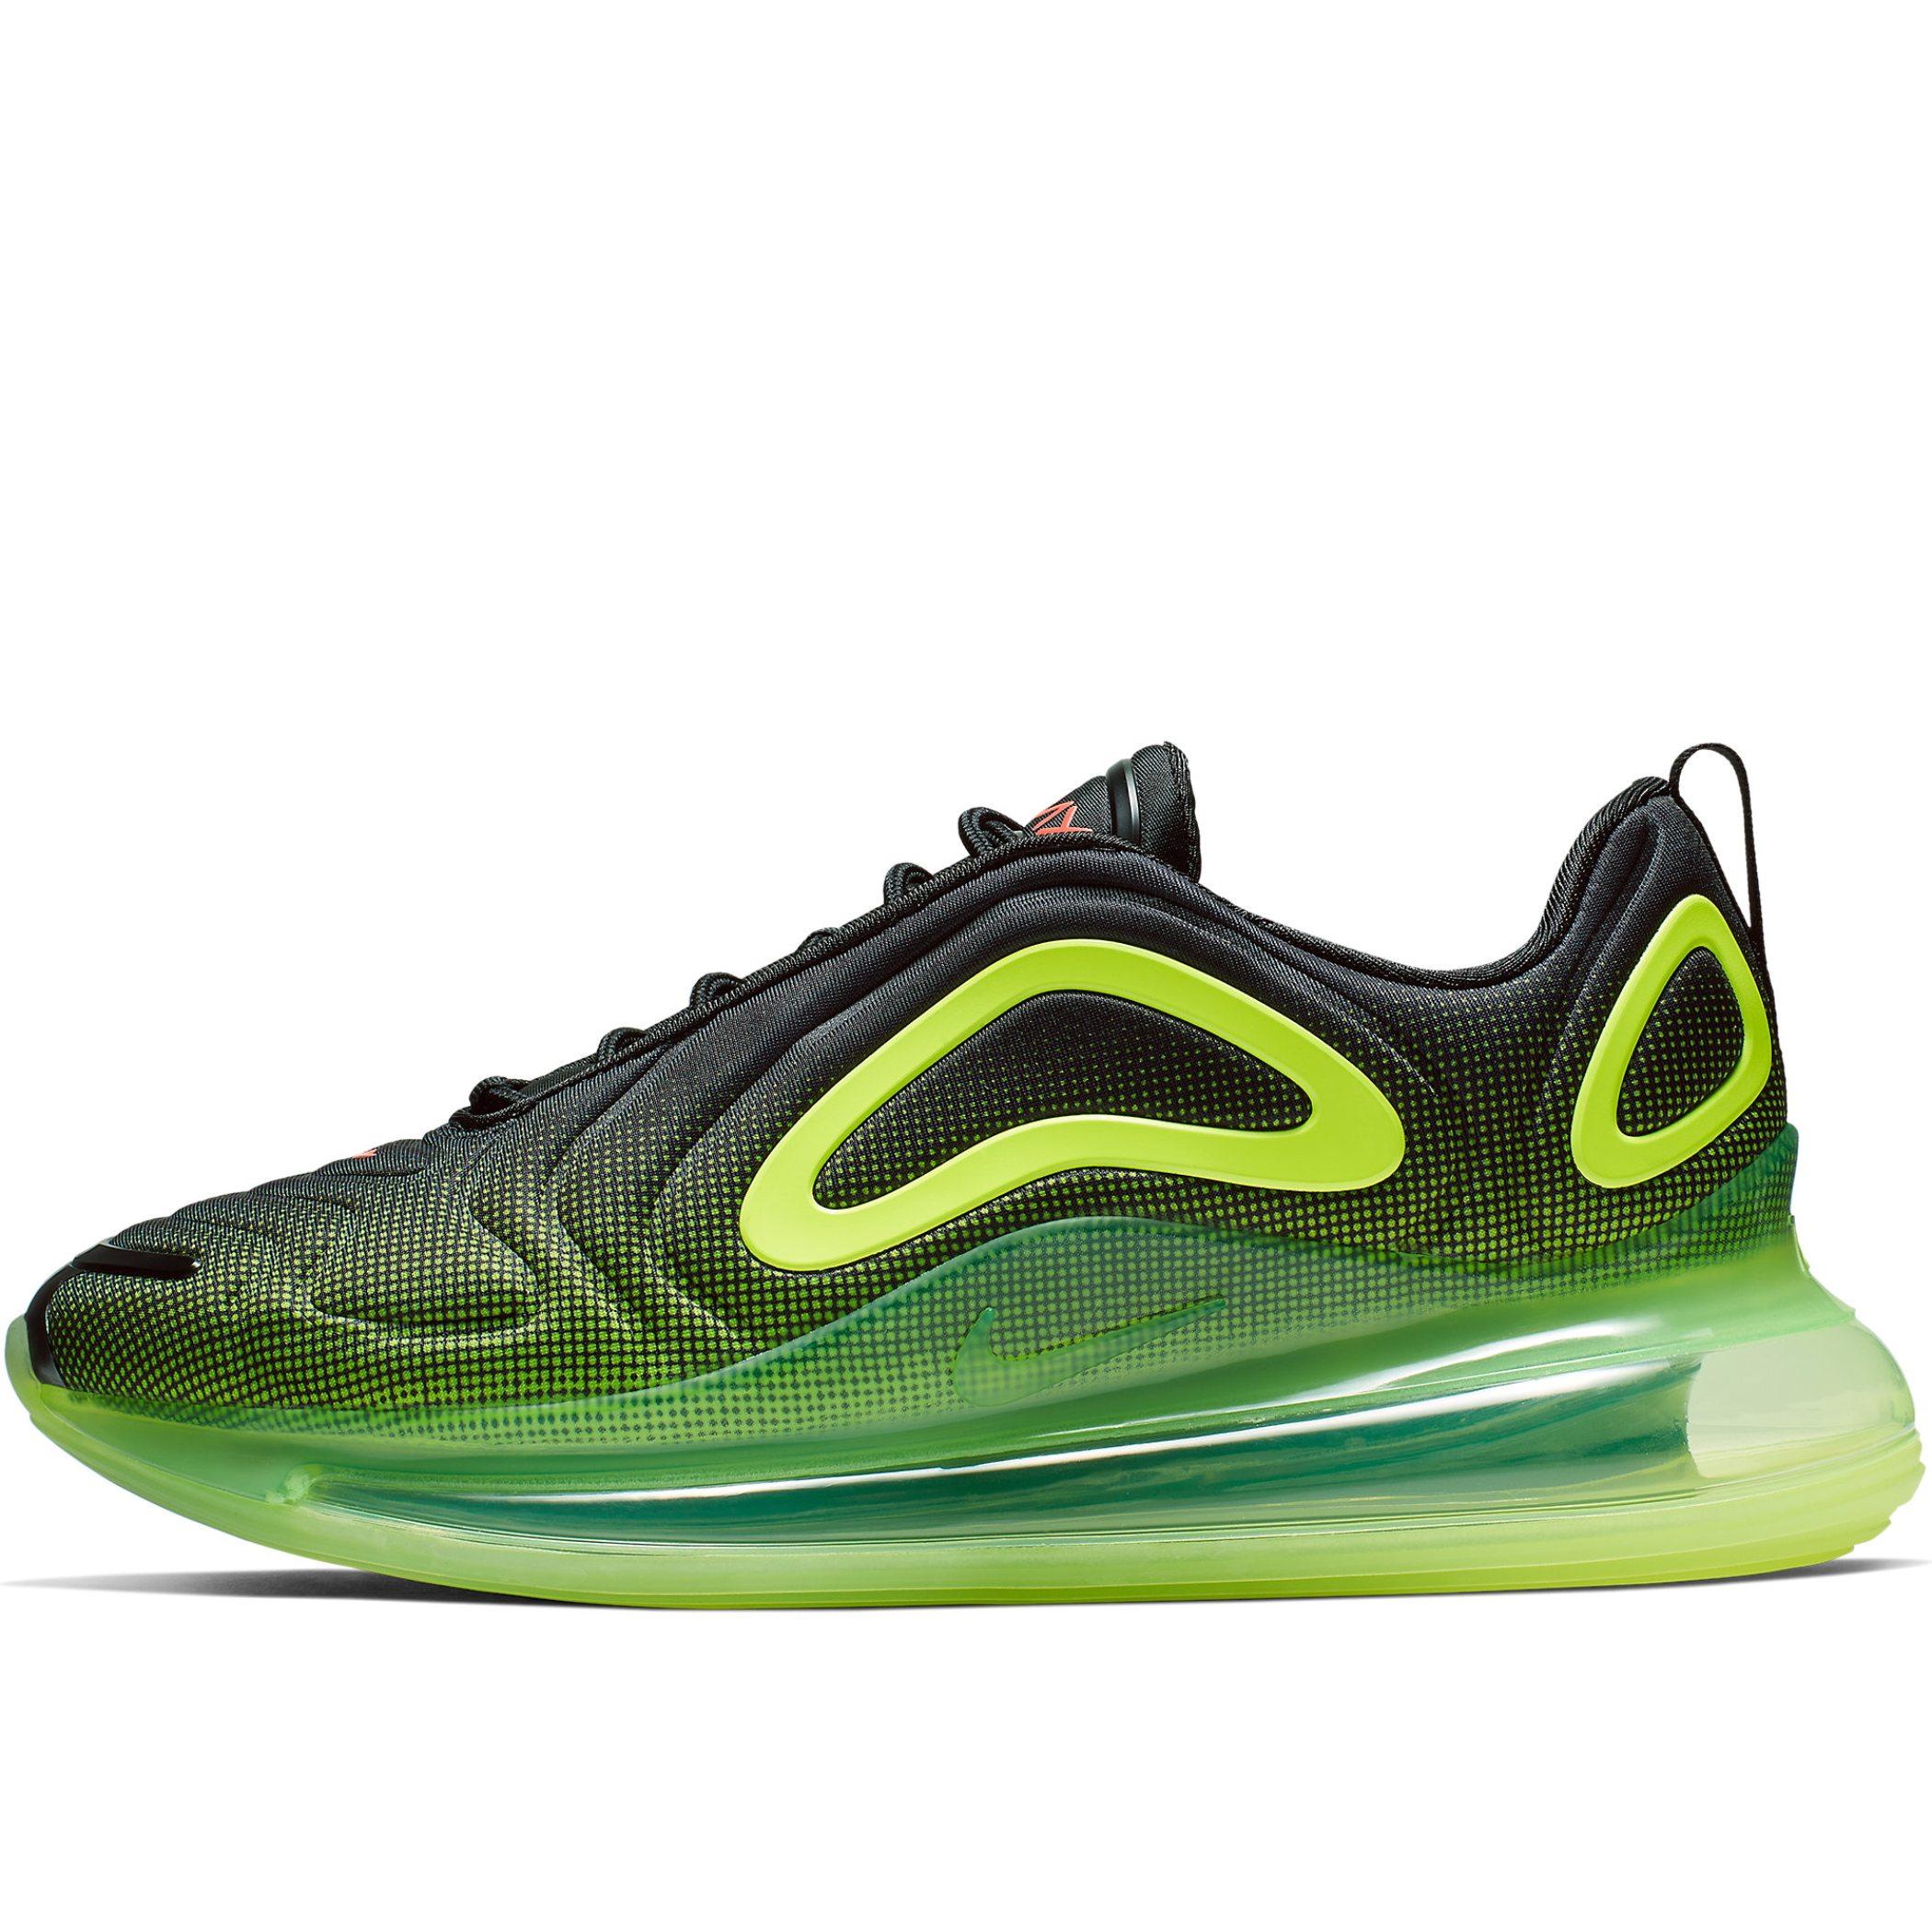 652382e1 Мужские кроссовки Nike Air Max 720 Black/Bright Crimson-Volt - фото 1